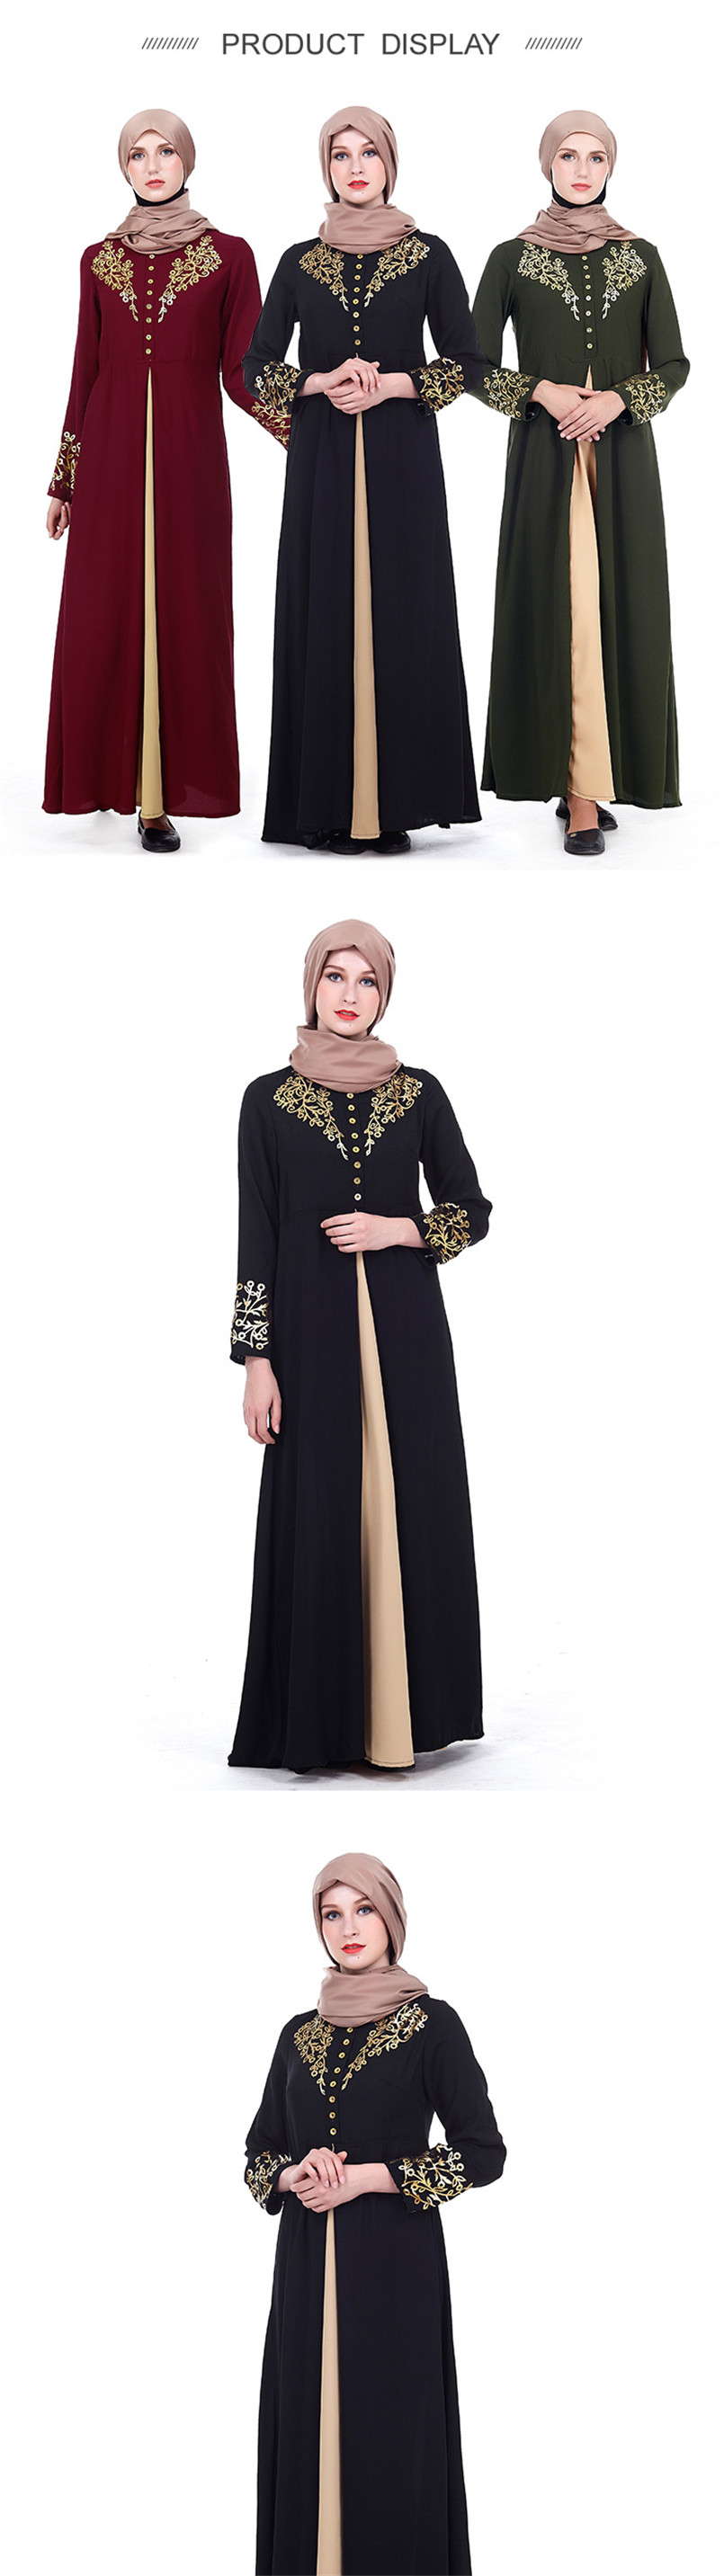 Gold Stamping Print Formal Muslim Women's Prayer Garment Arabic Caftan Dress Robe Longa Moslim Jurken Jubah Islamic Clothing